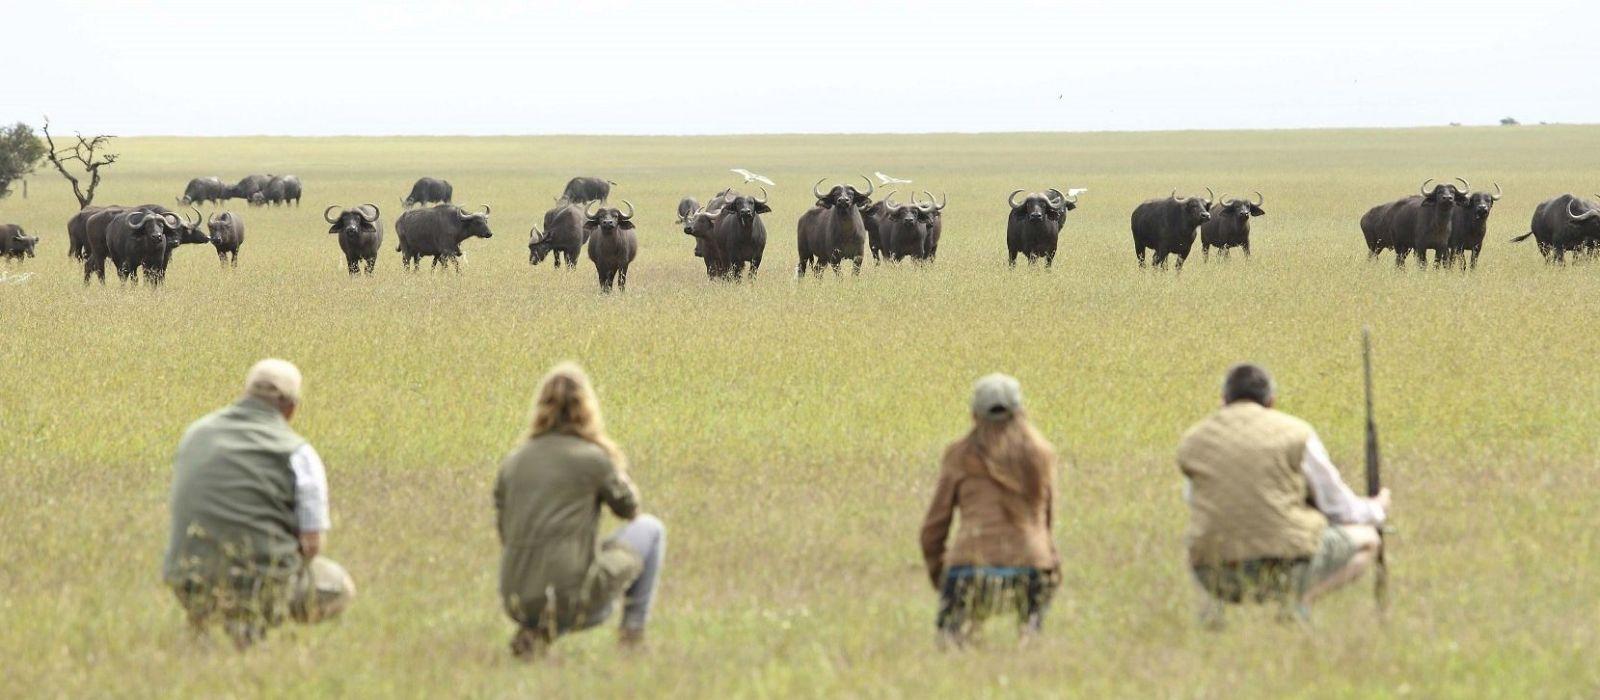 safari trips - Walking Safari Animals